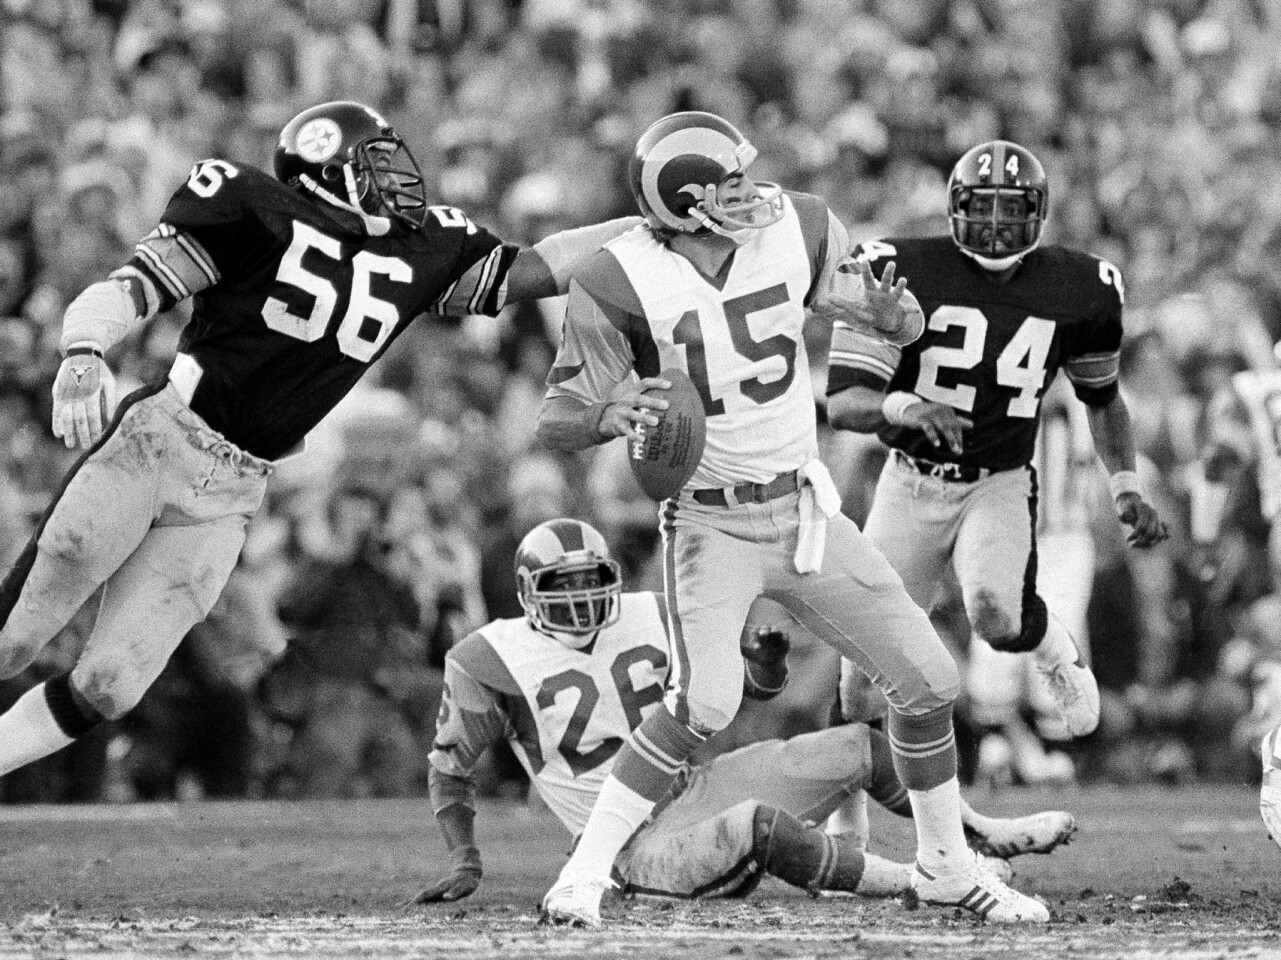 Los Angeles Rams vs. Pittsburgh Steelers in Super Bowl XIV